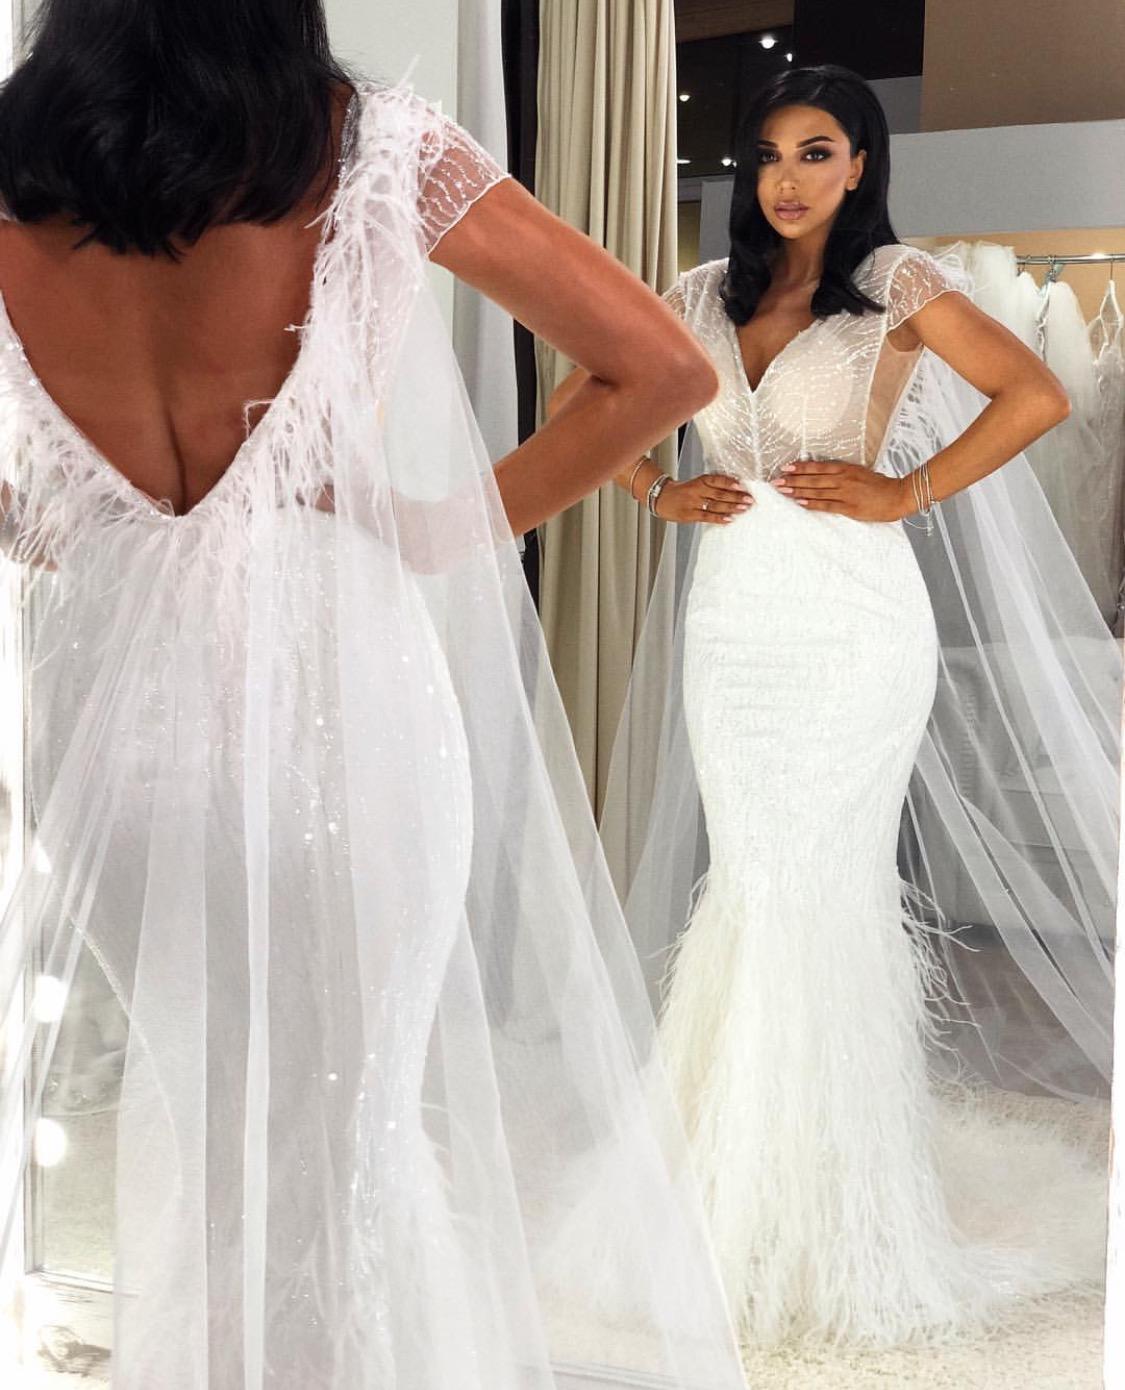 The sexiest wedding dress ever